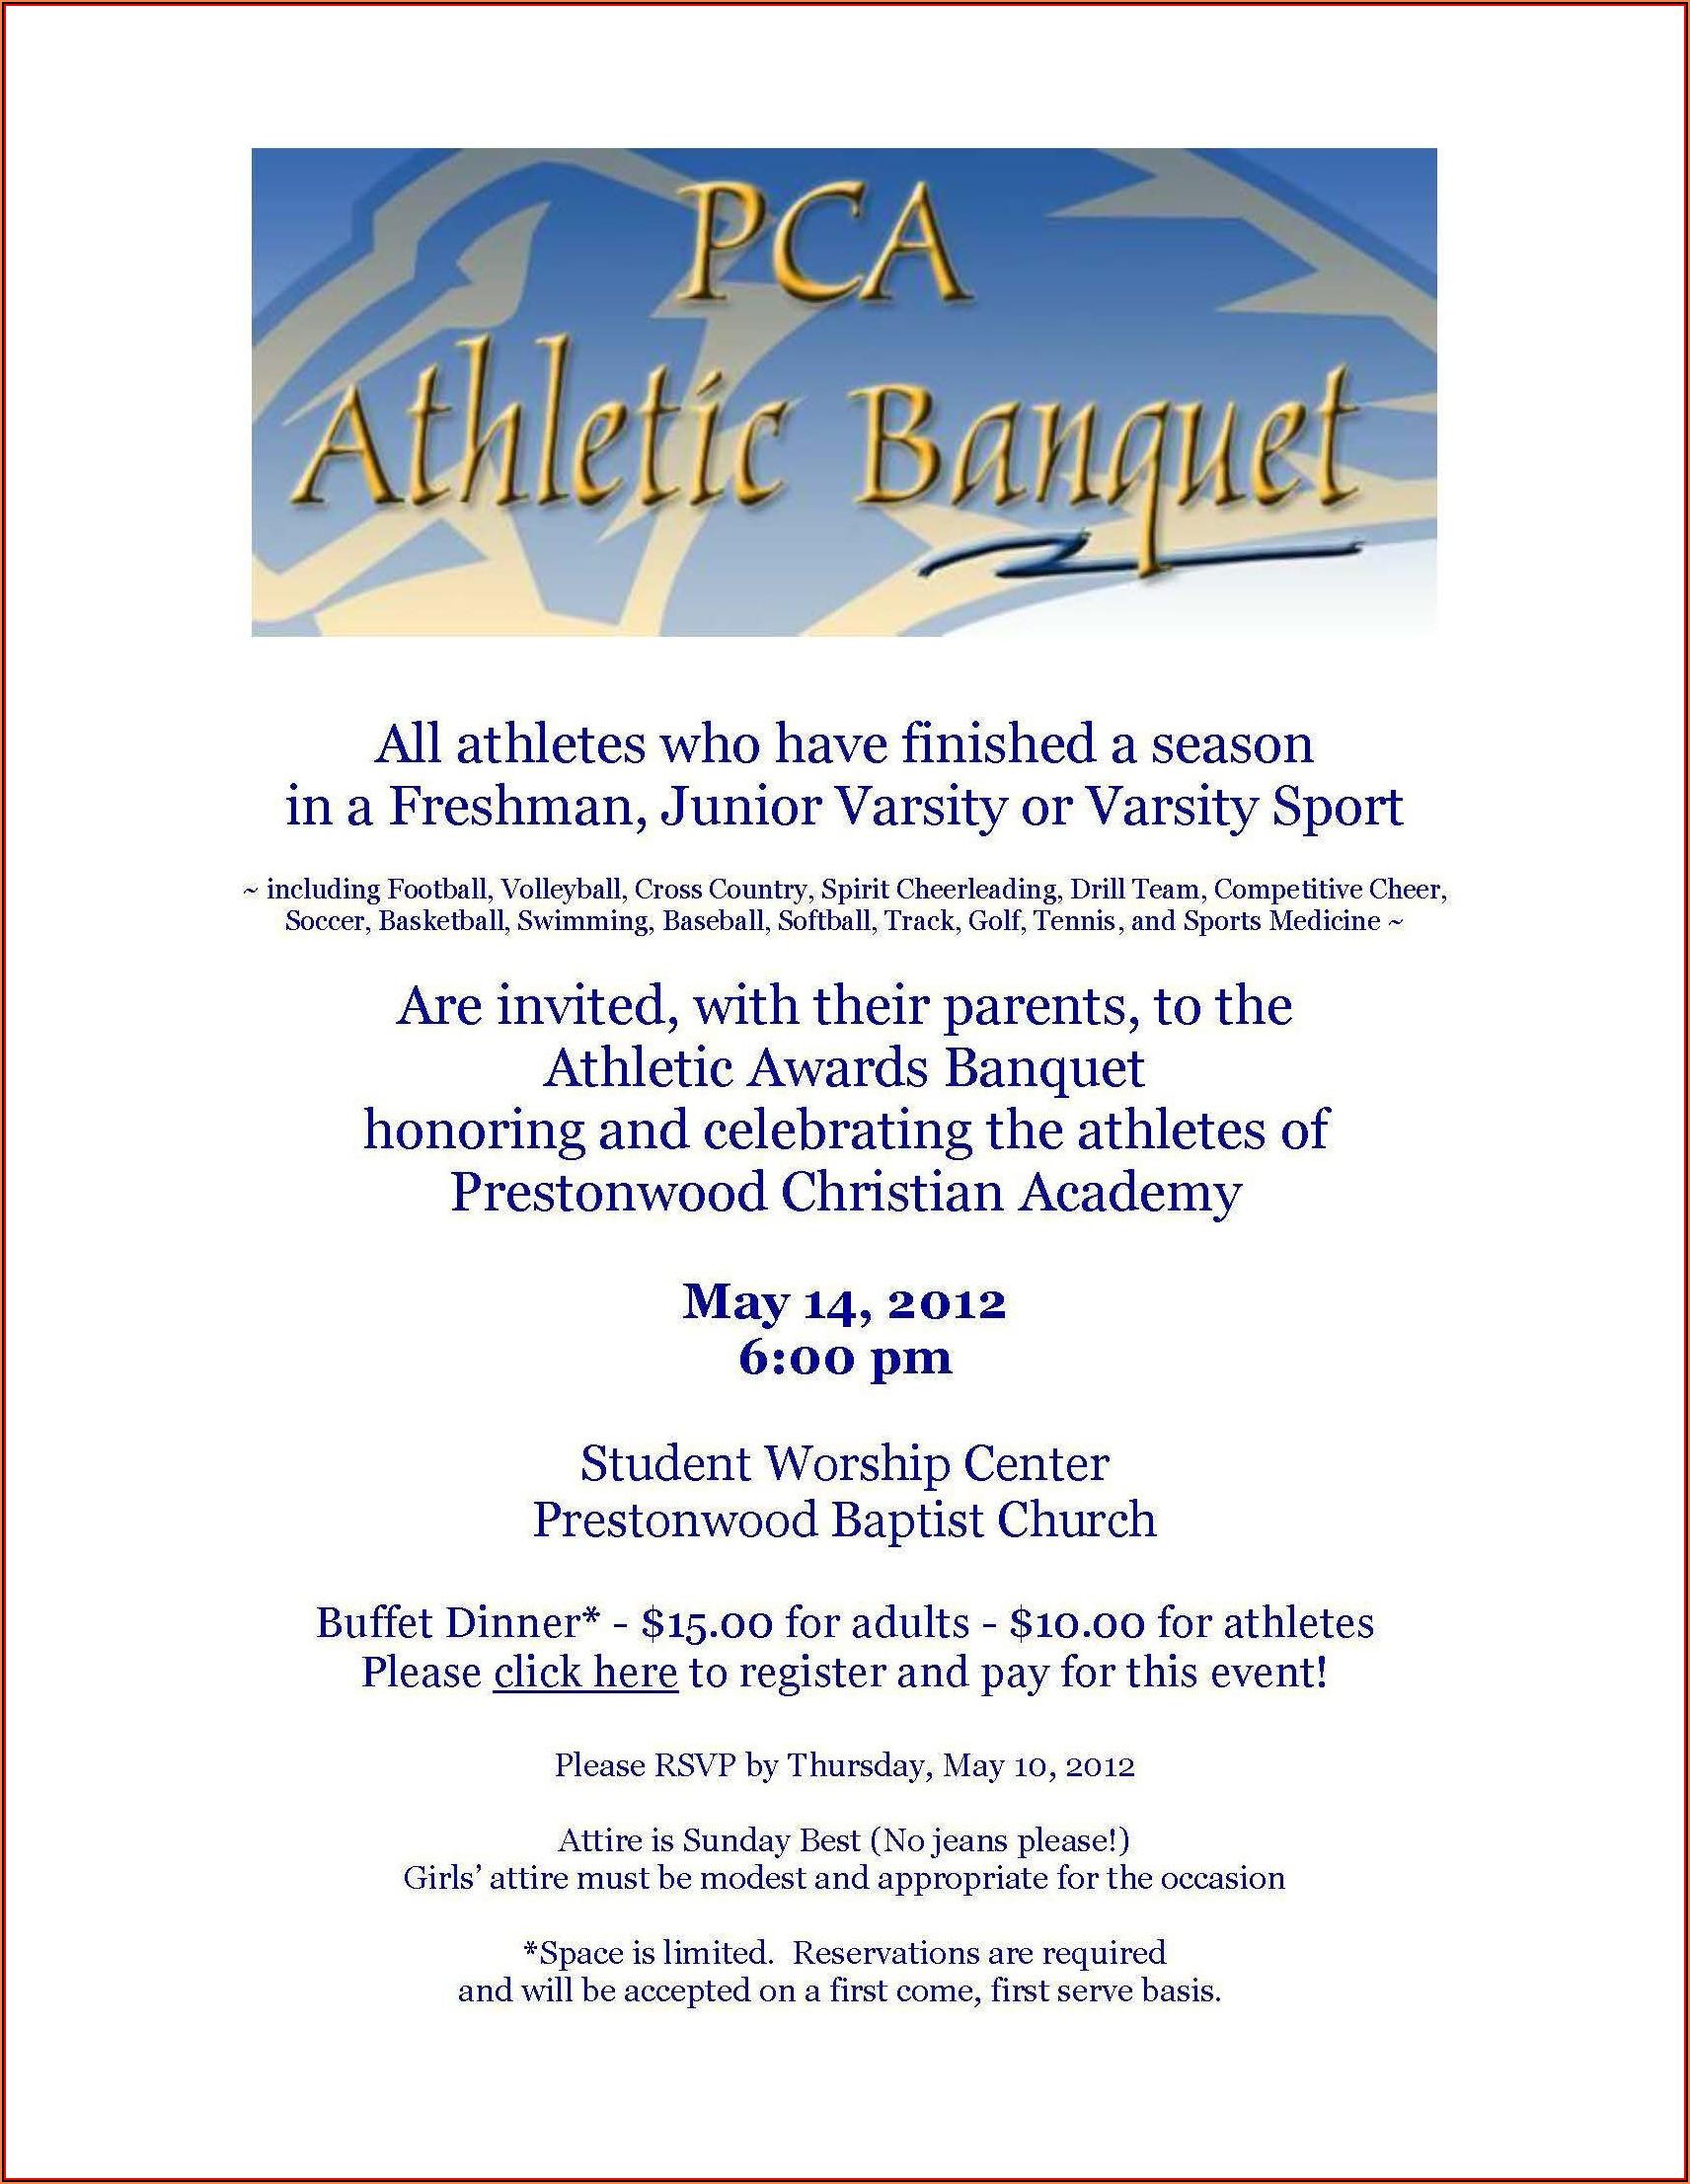 Basketball Banquet Invitation Template